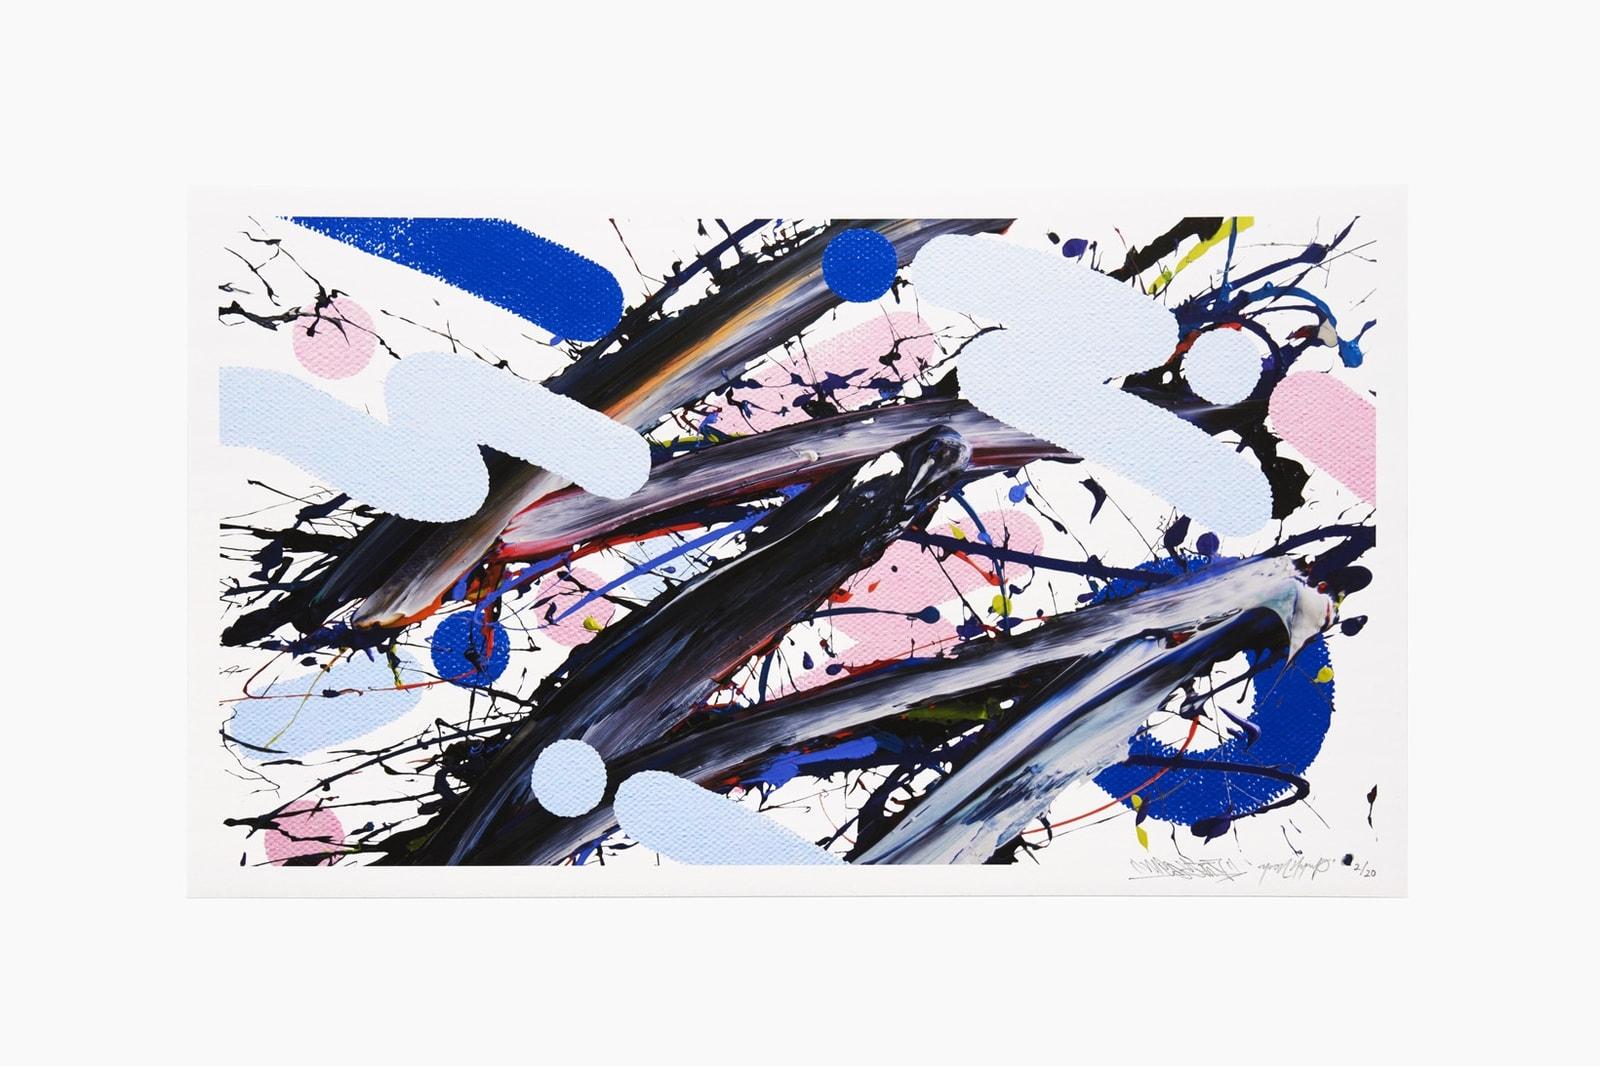 adam lucas alex chinneck james jirat meguru yamaguchi yoon hyup art artworks prints paintings sculptures